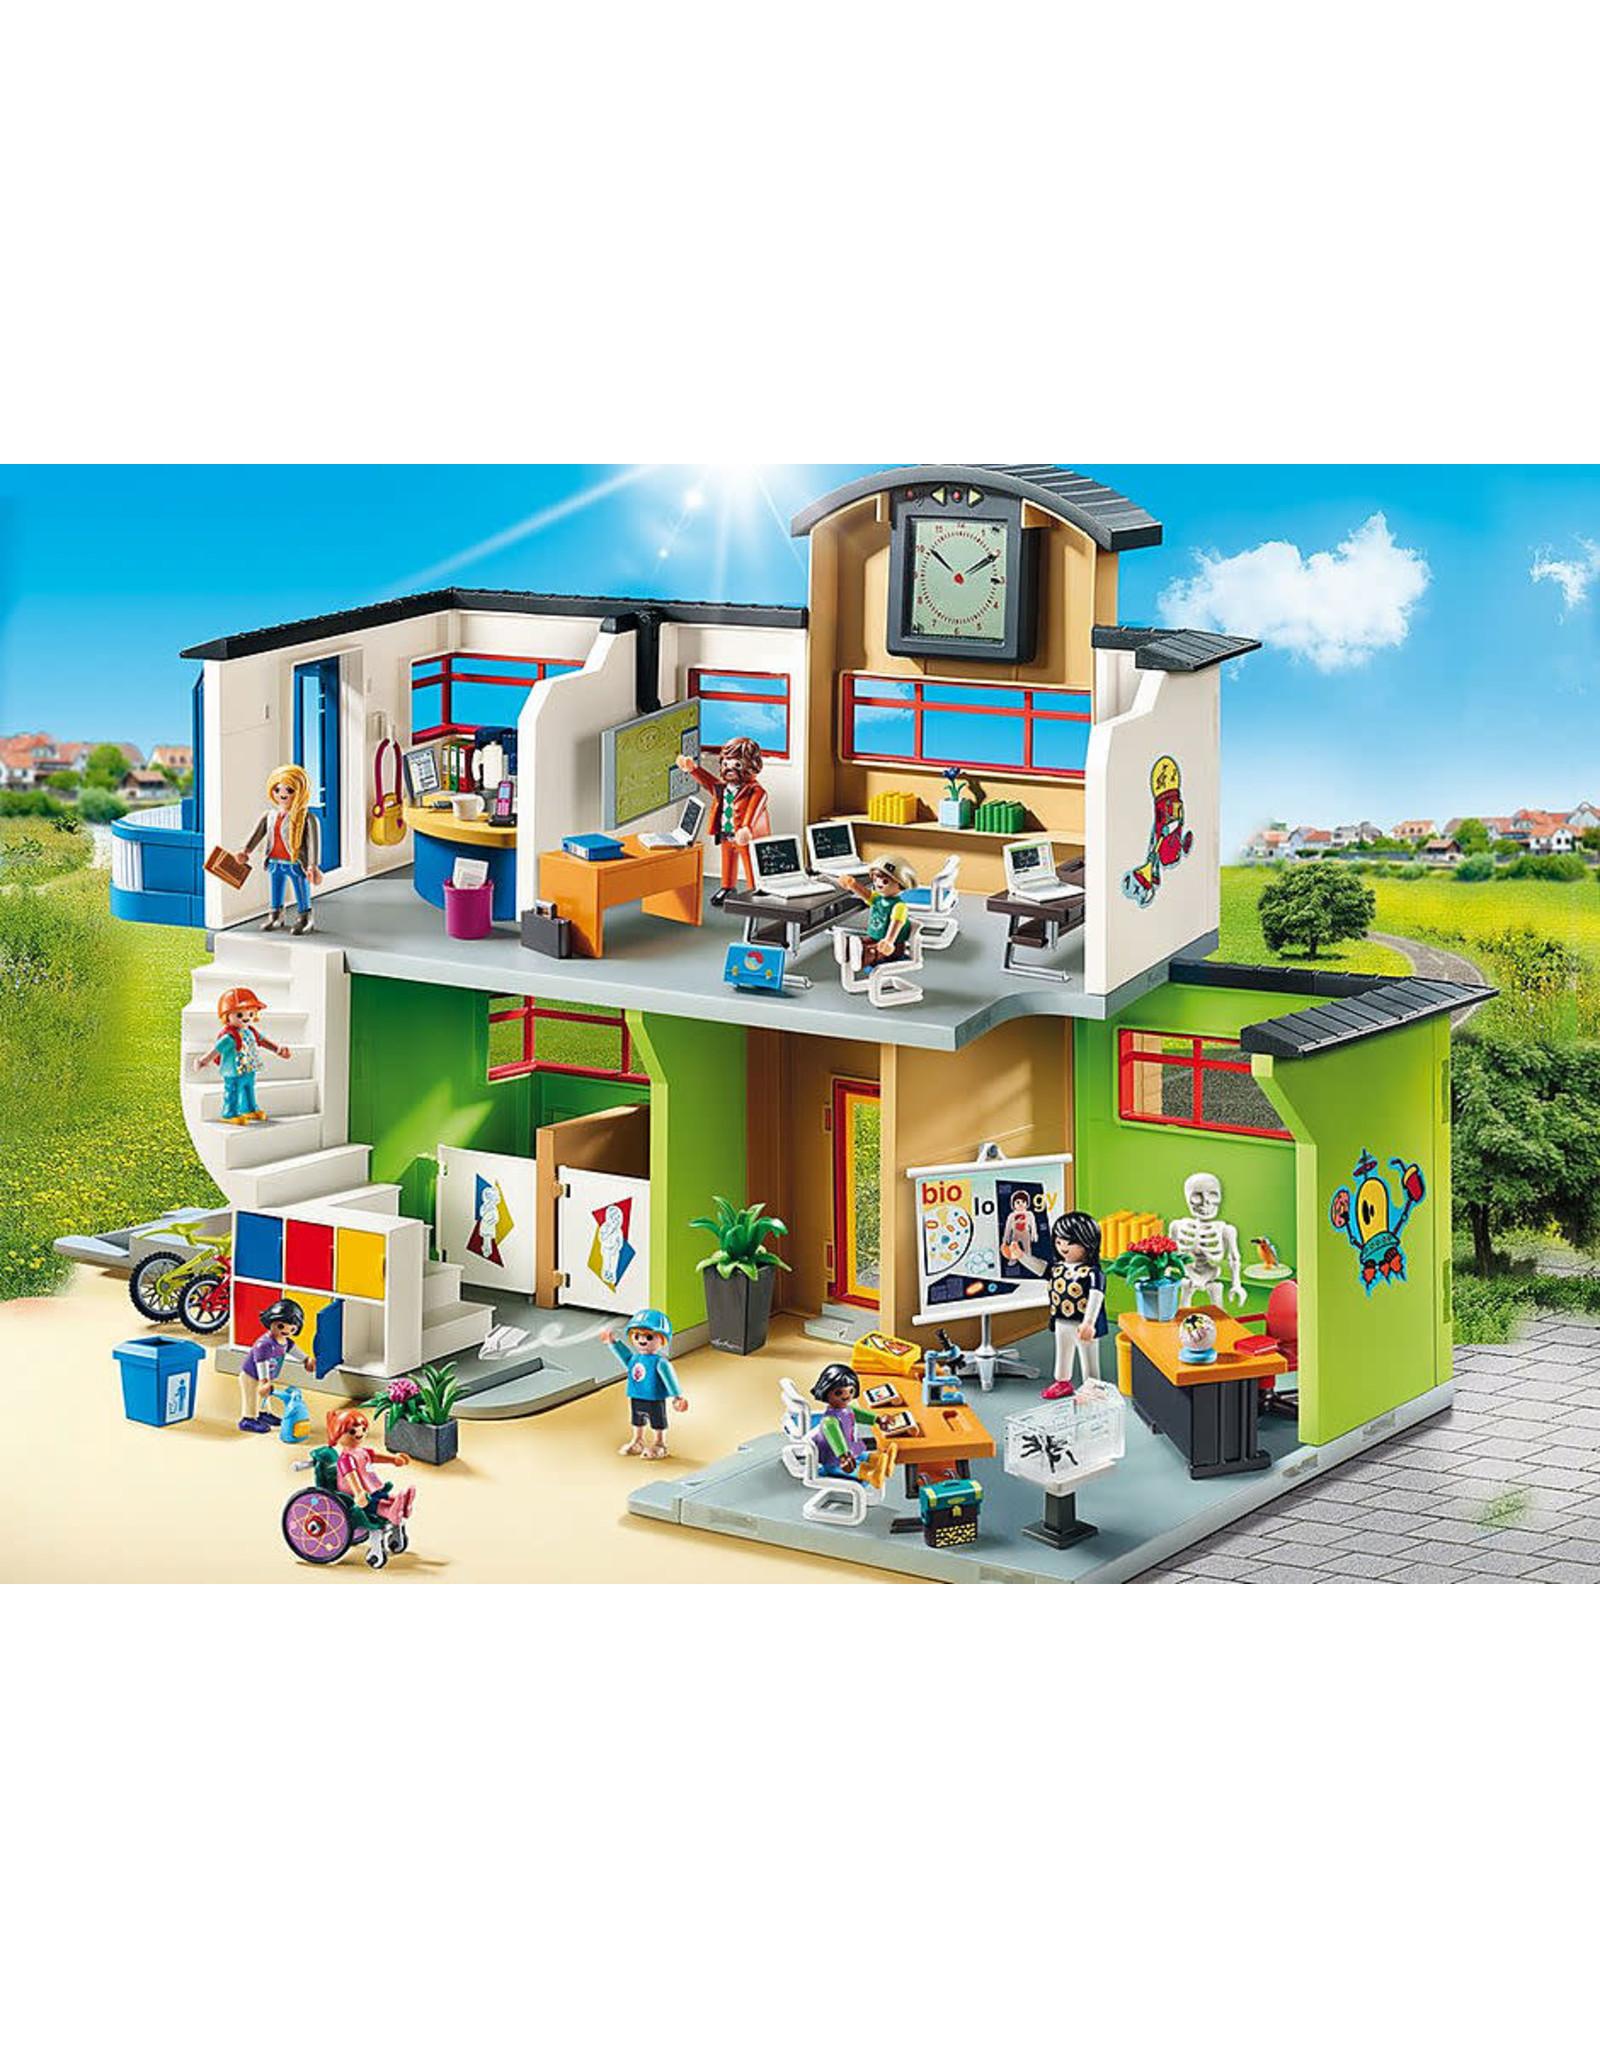 Playmobil Furnished School Building